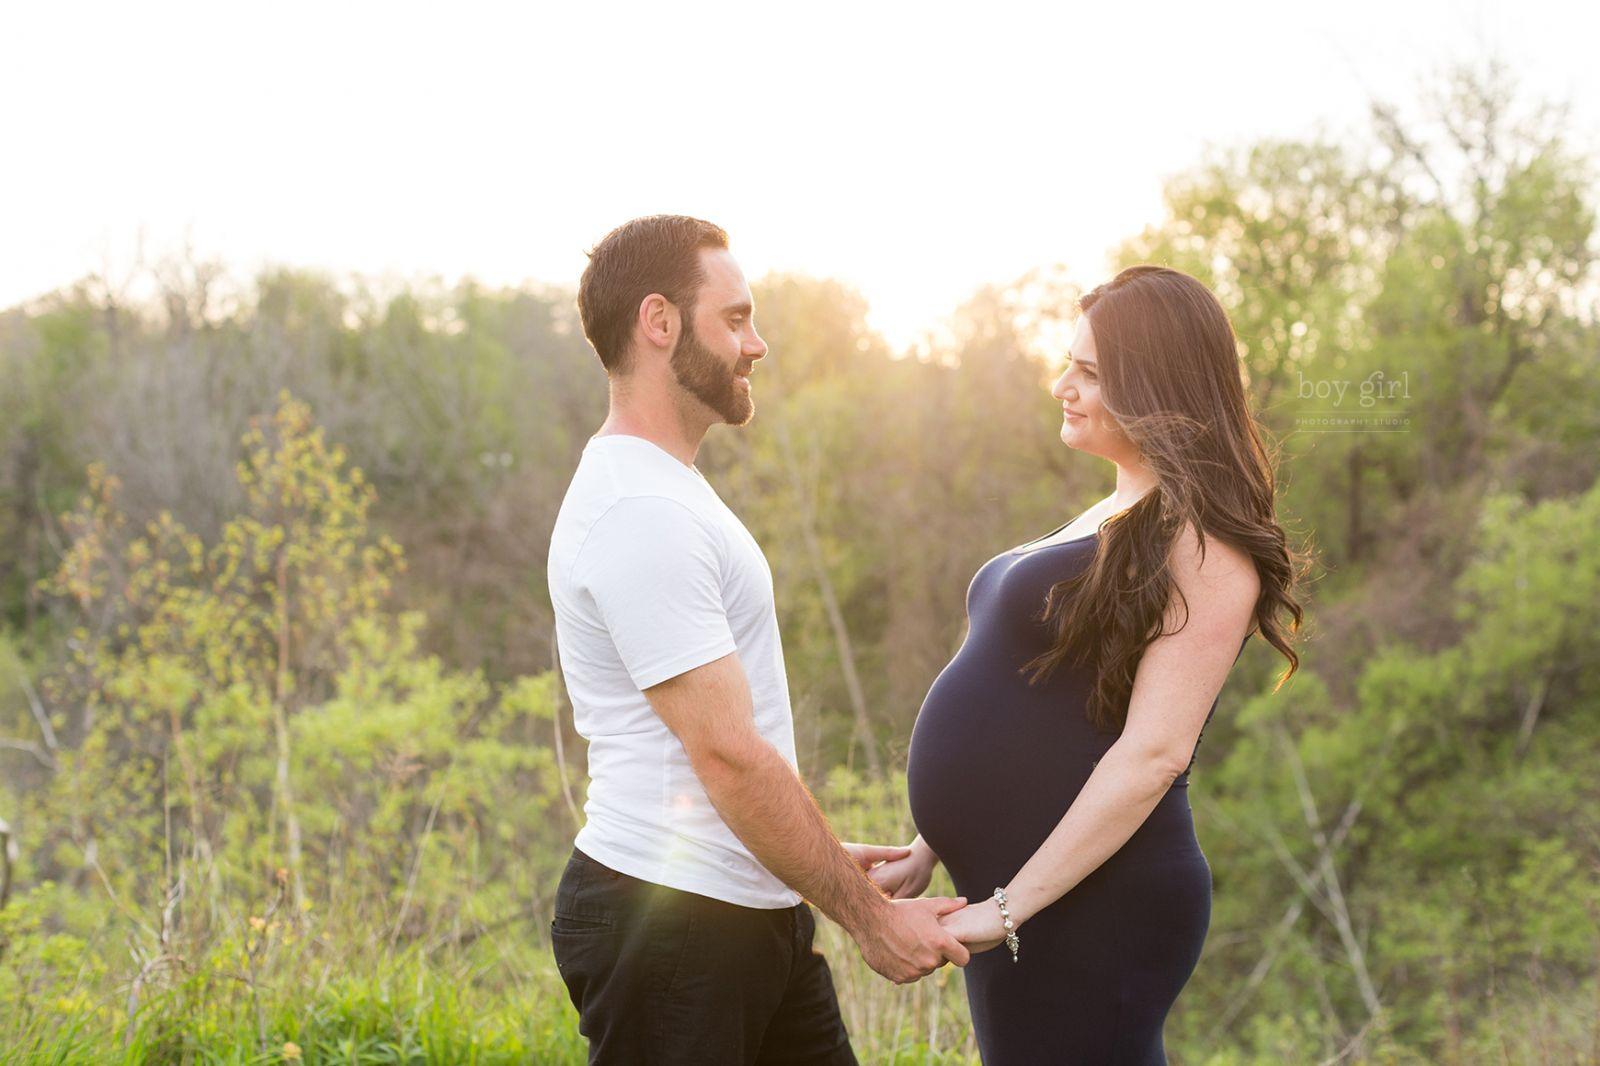 Toronto Maternity Photographer Boy Girl Photography